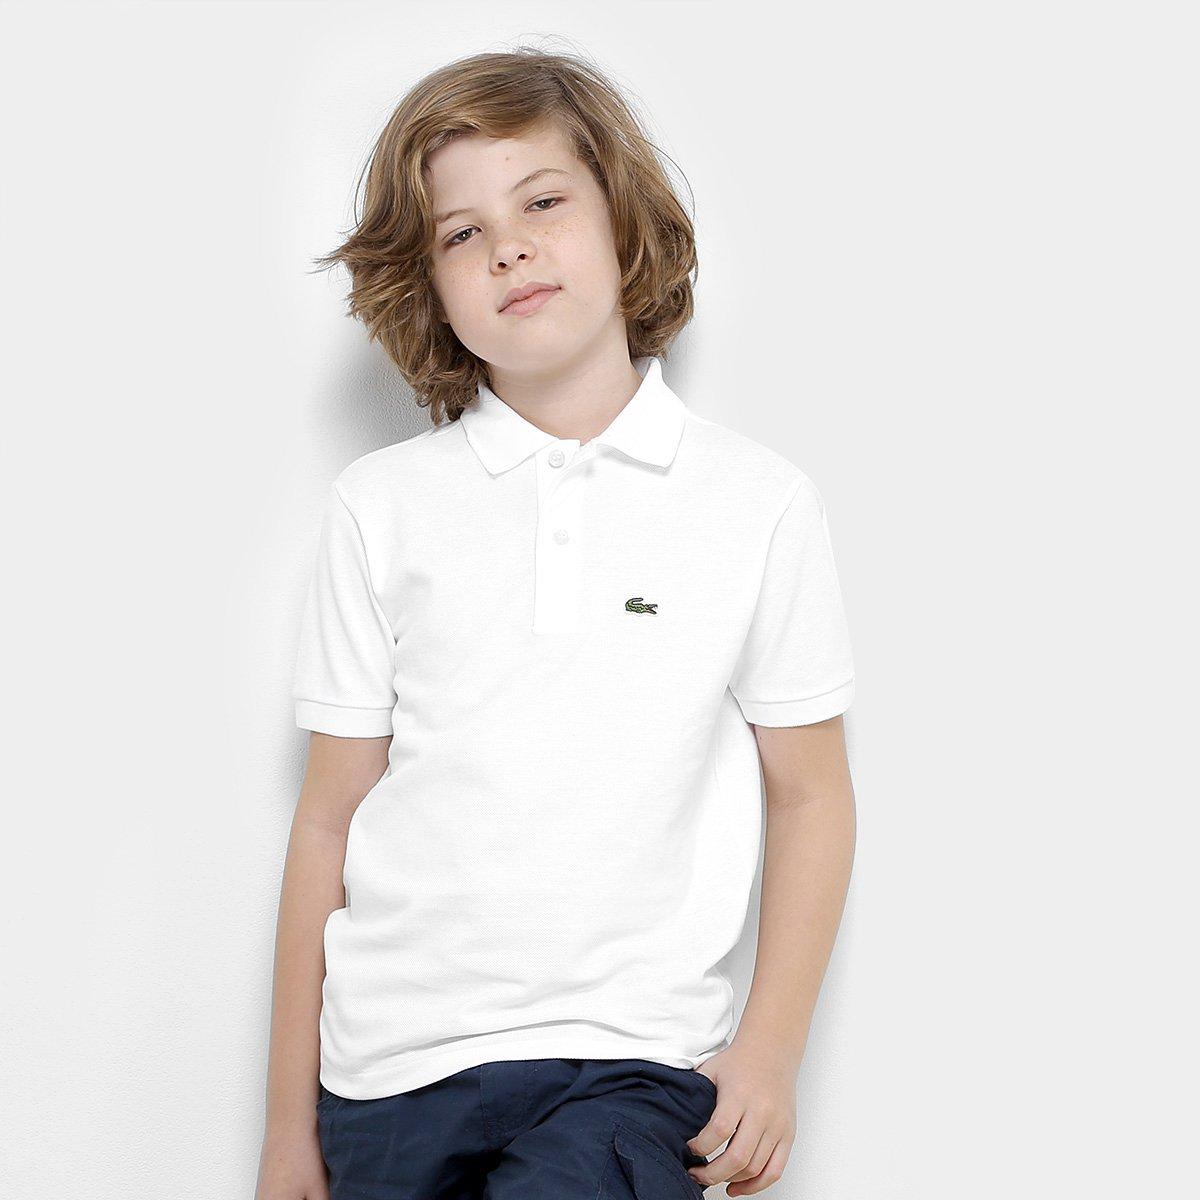 1d2665288cc80 Camisa Polo Infantil Lacoste Masculina - Branco - Compre Agora ...